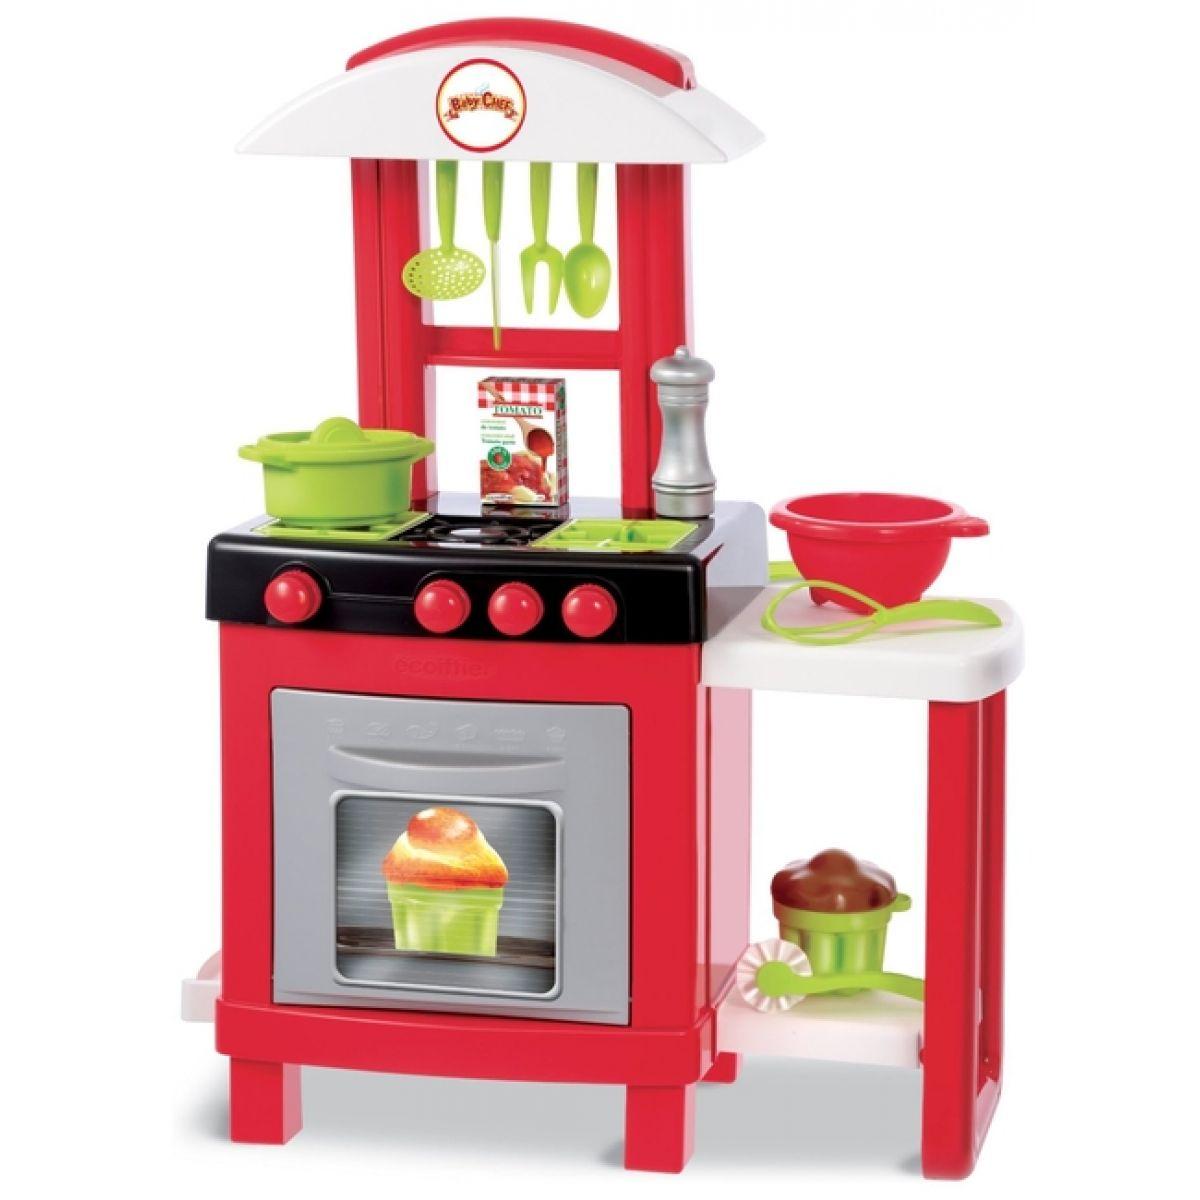 Ecoffier Kuchyňka Pro-cook